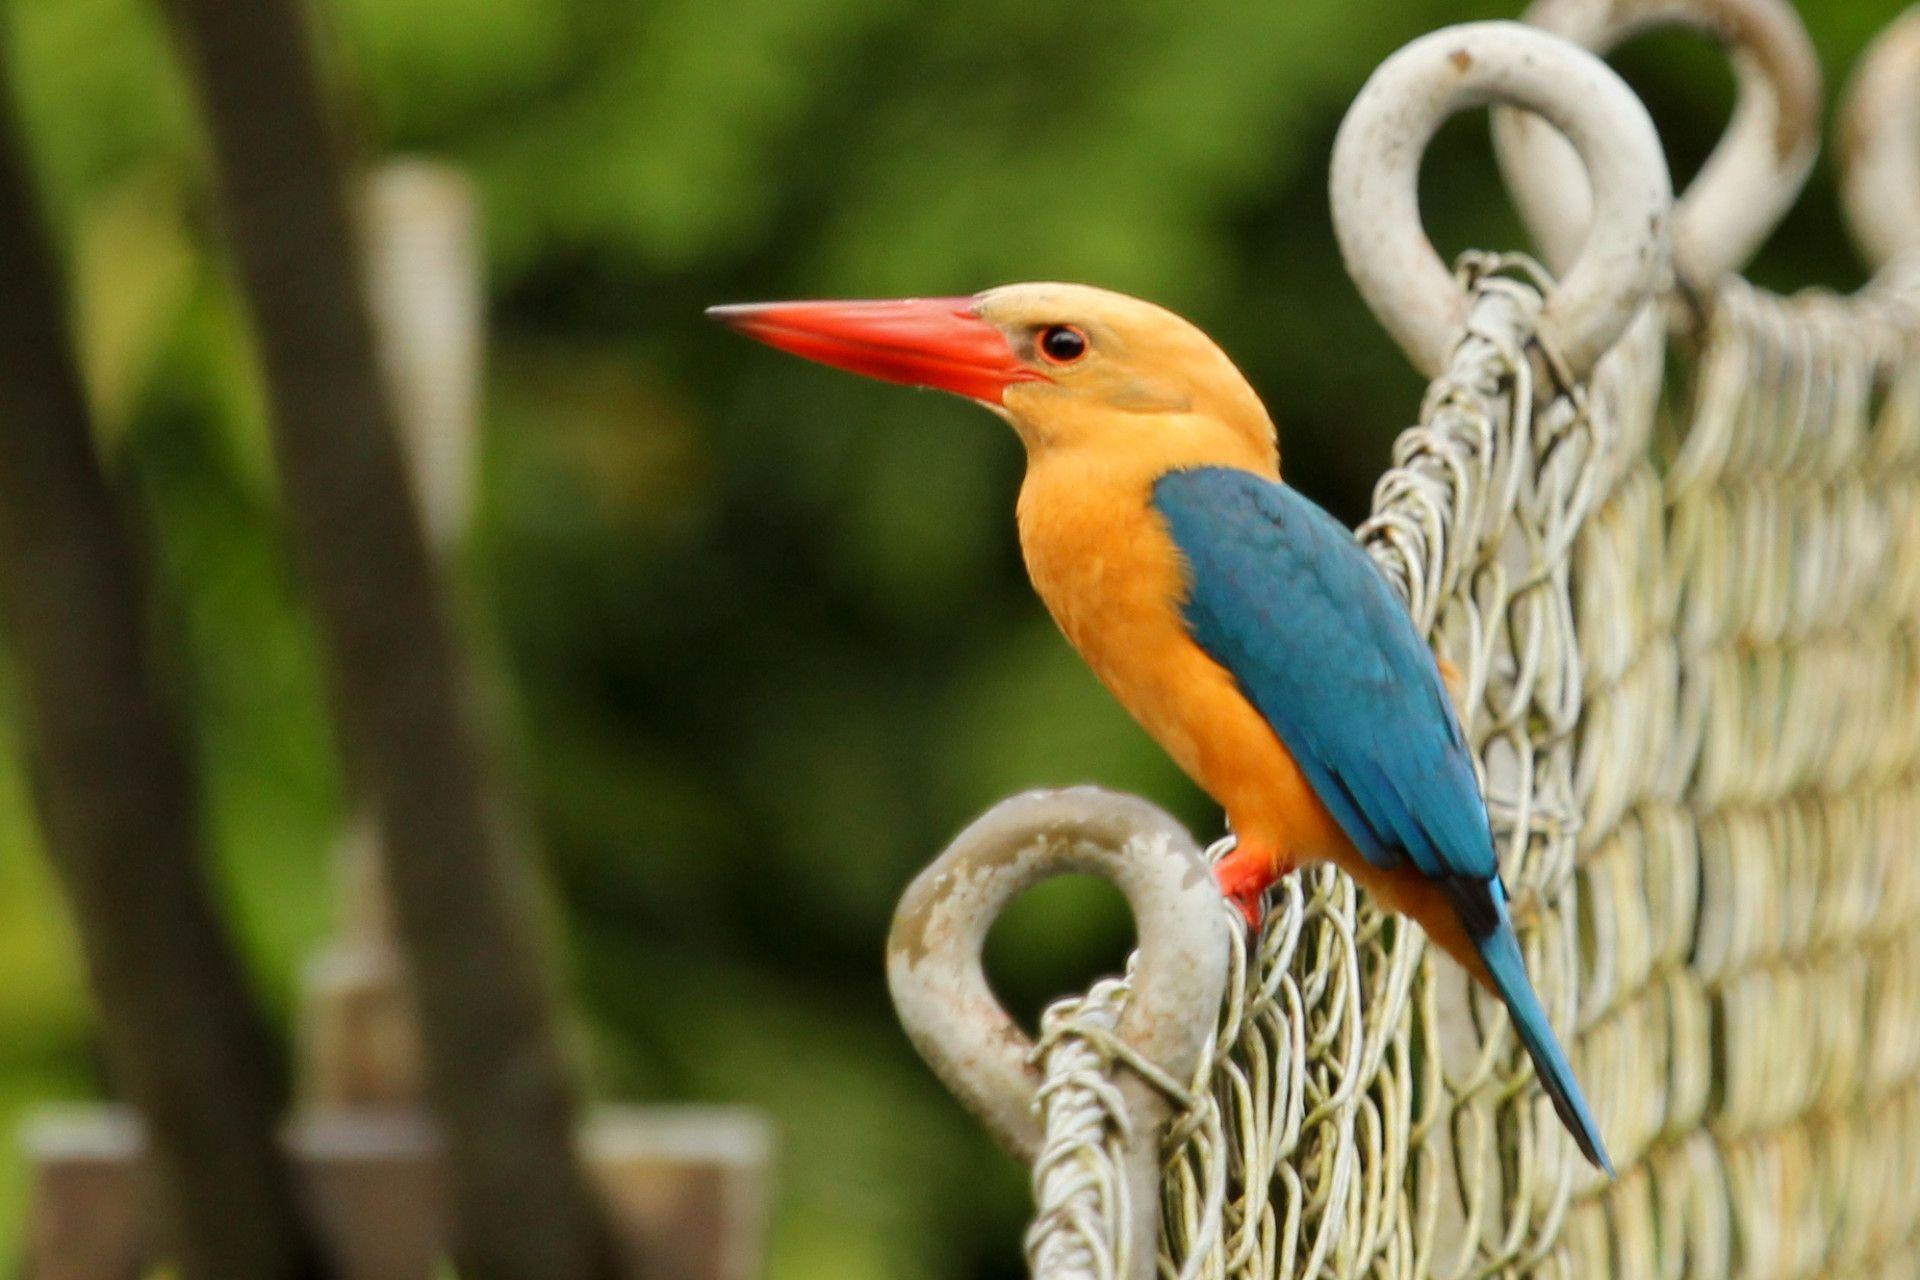 Stork-Billed Kingfisher, (Pelargopsis capensis)  Range: Nepal to India, Sri Lanka and northwest Myanmar